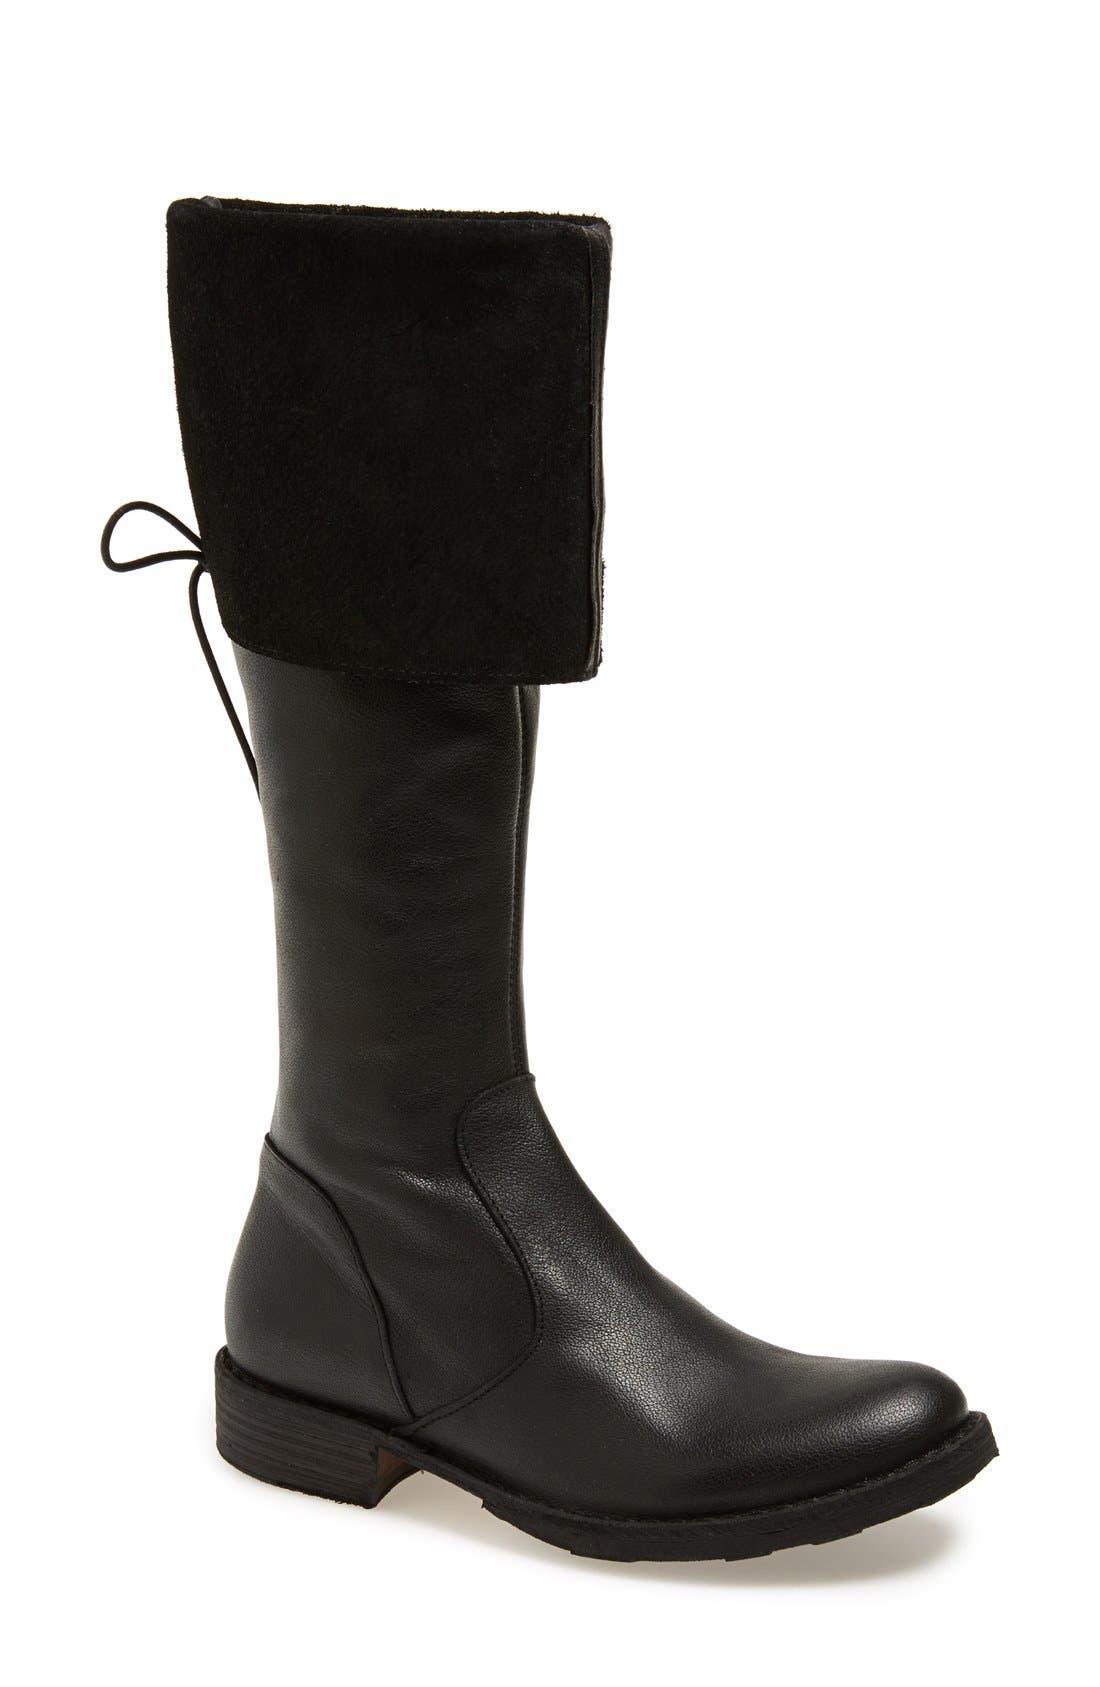 fiorentini baker knee high boot narrow calf